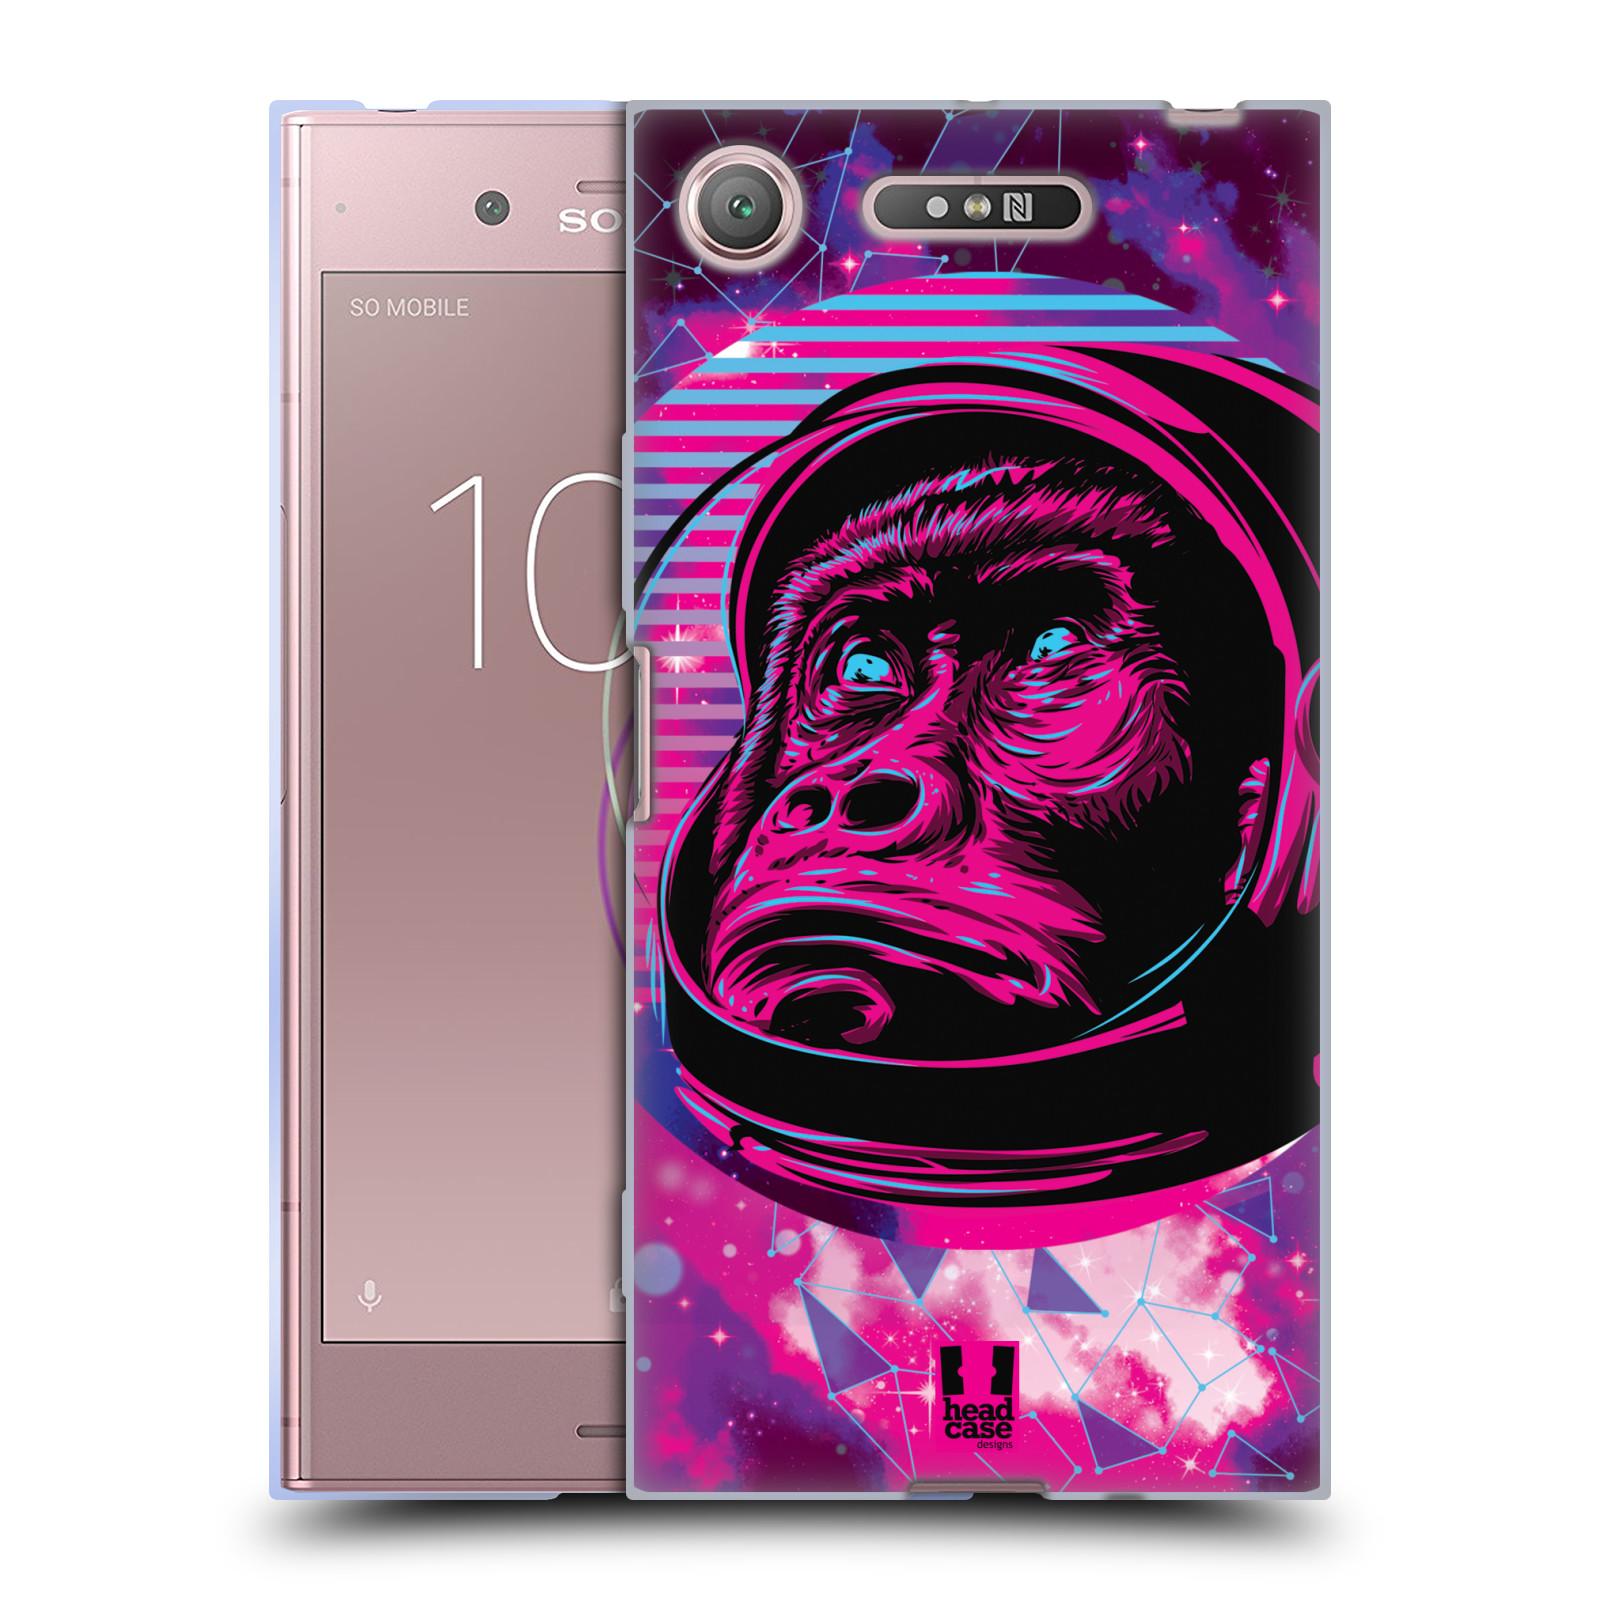 Silikonové pouzdro na mobil Sony Xperia XZ1 - Head Case - Gorila ve skafandru